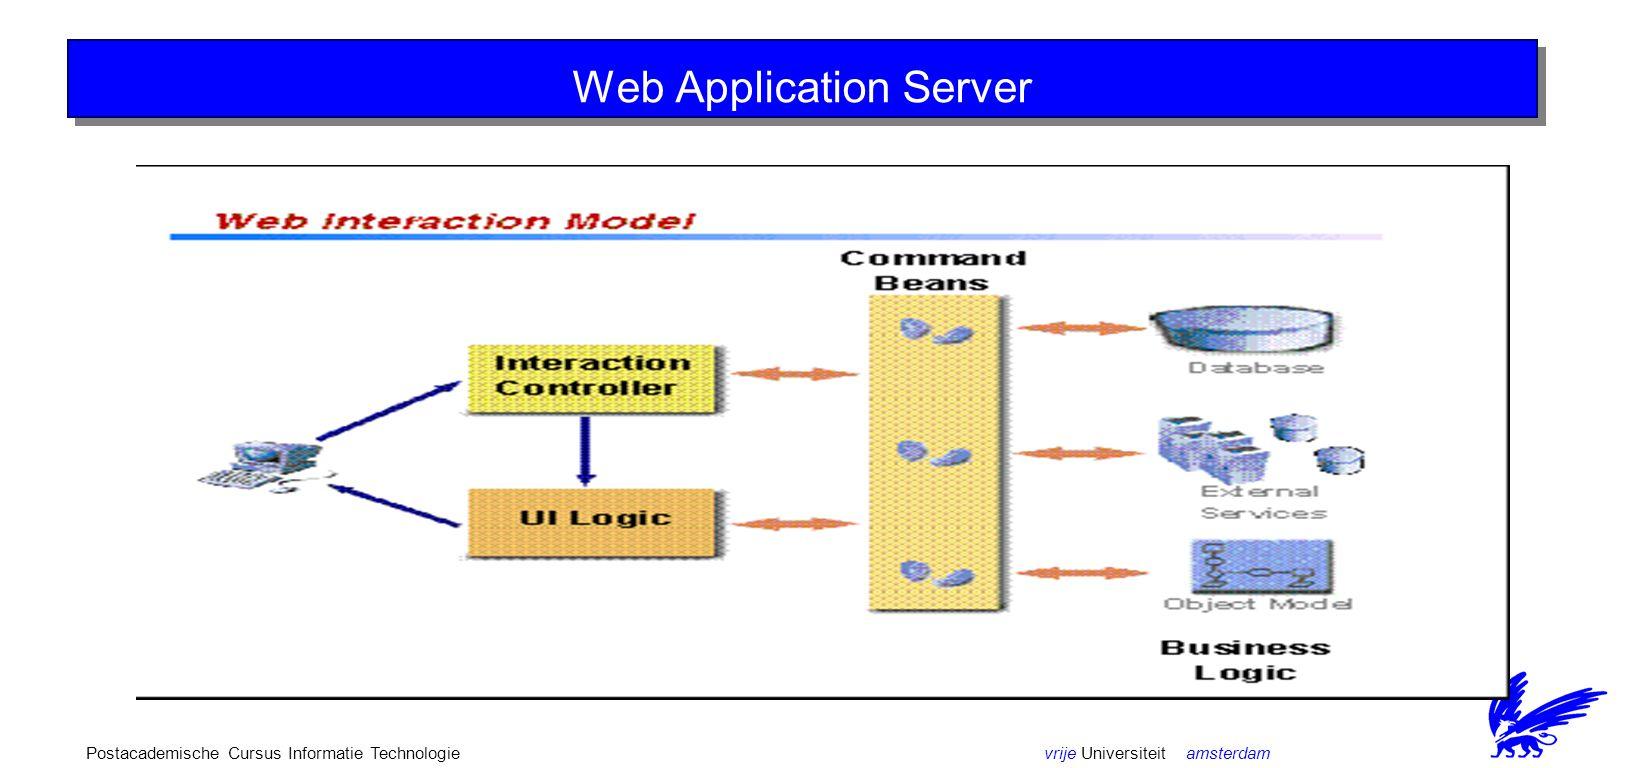 vrije Universiteit amsterdamPostacademische Cursus Informatie Technologie The Ubiqitous Client